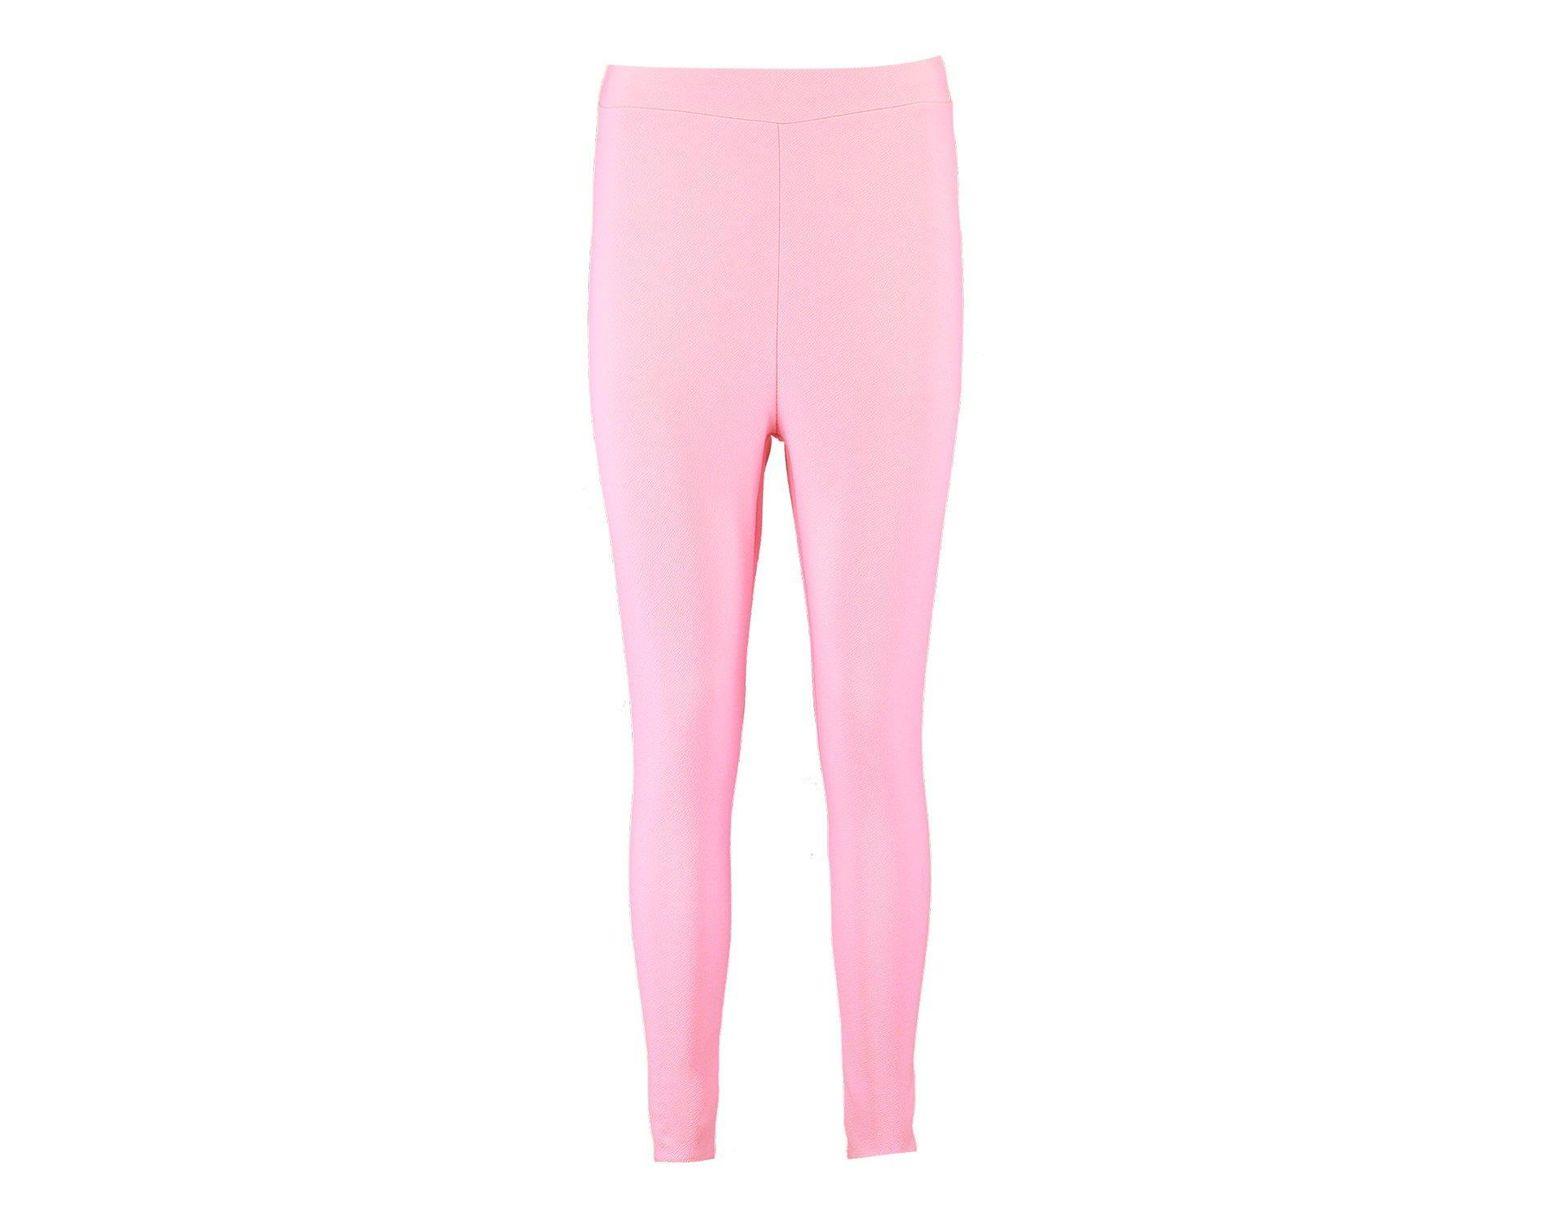 56662caf8426e Boohoo Pastel Crepe High Waist Leggings in Pink - Lyst